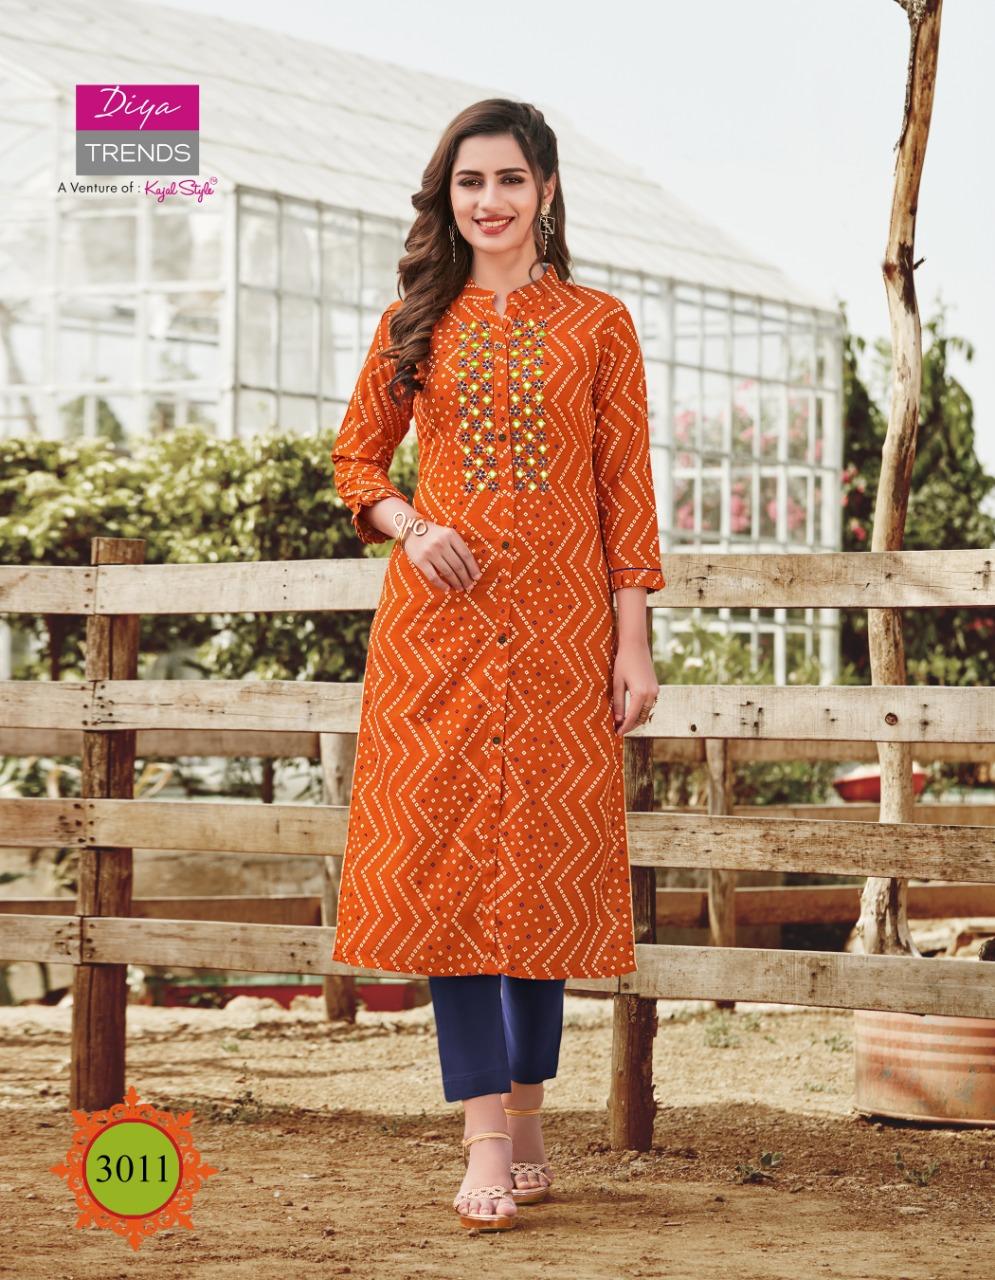 Diya Trends Victoria Vol 3 by Kajal Style Kurti Wholesale Catalog 12 Pcs 10 - Diya Trends Victoria Vol 3 by Kajal Style Kurti Wholesale Catalog 12 Pcs